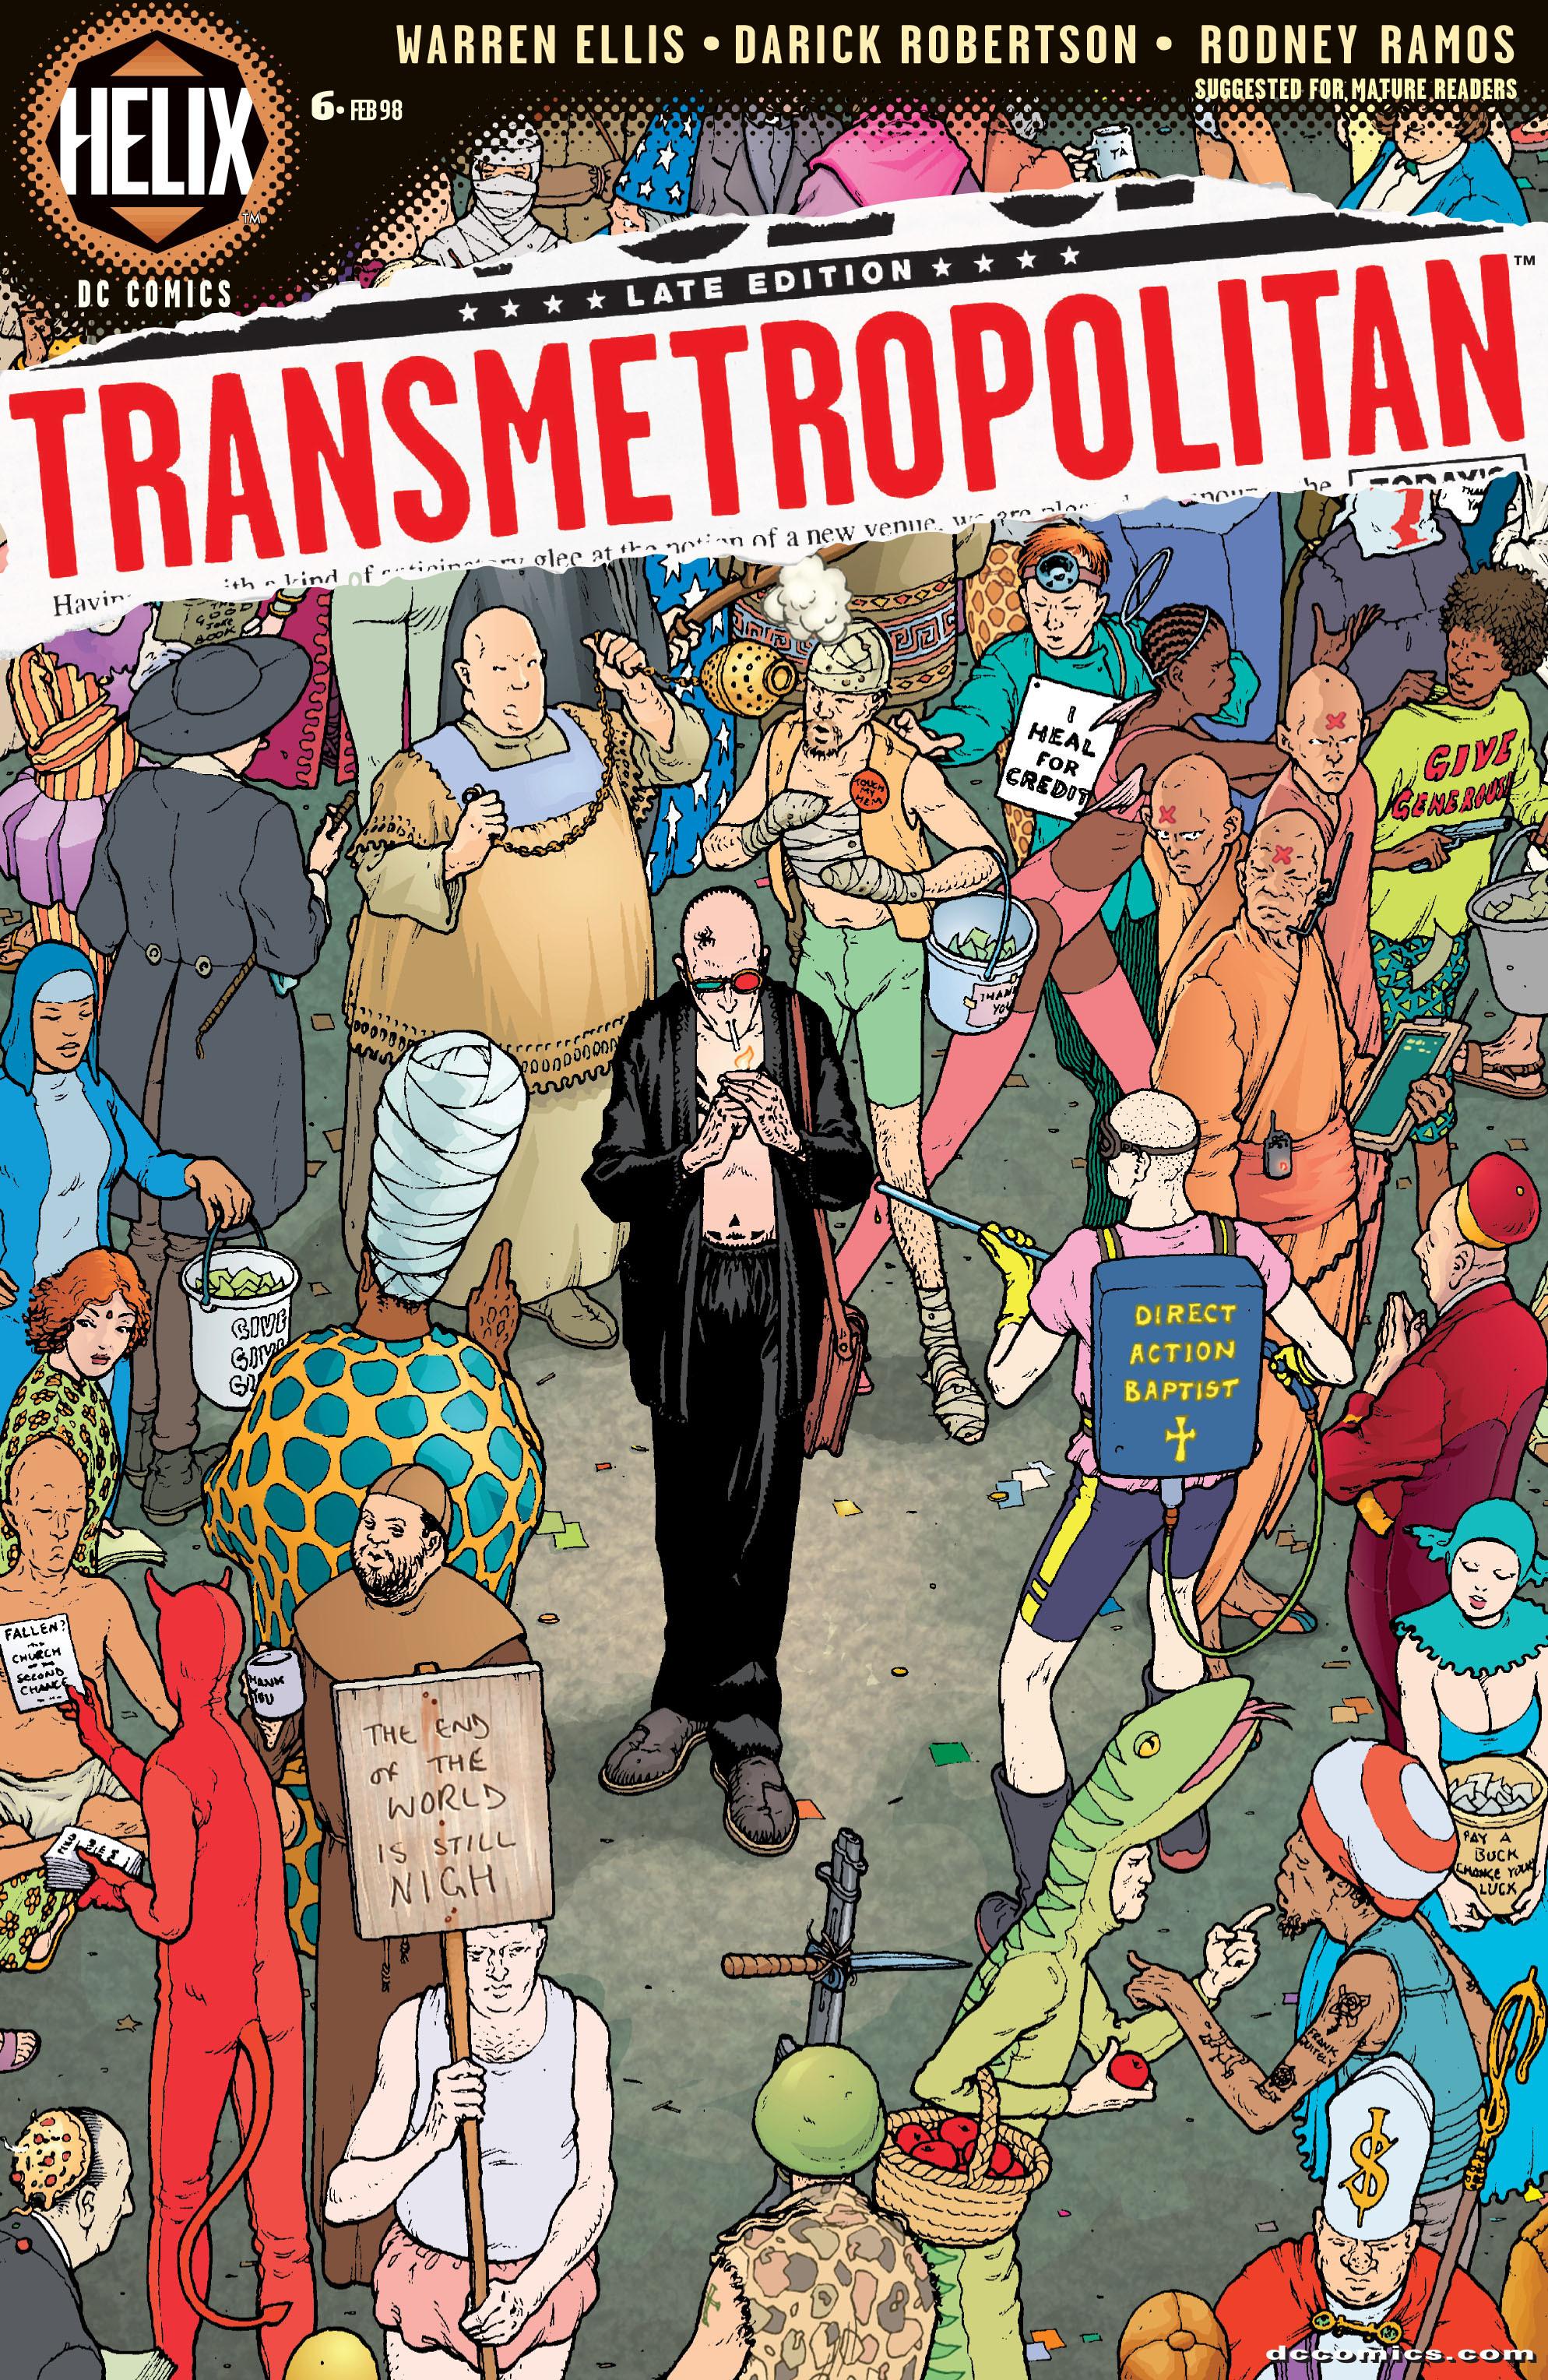 Read online Transmetropolitan comic -  Issue #6 - 1